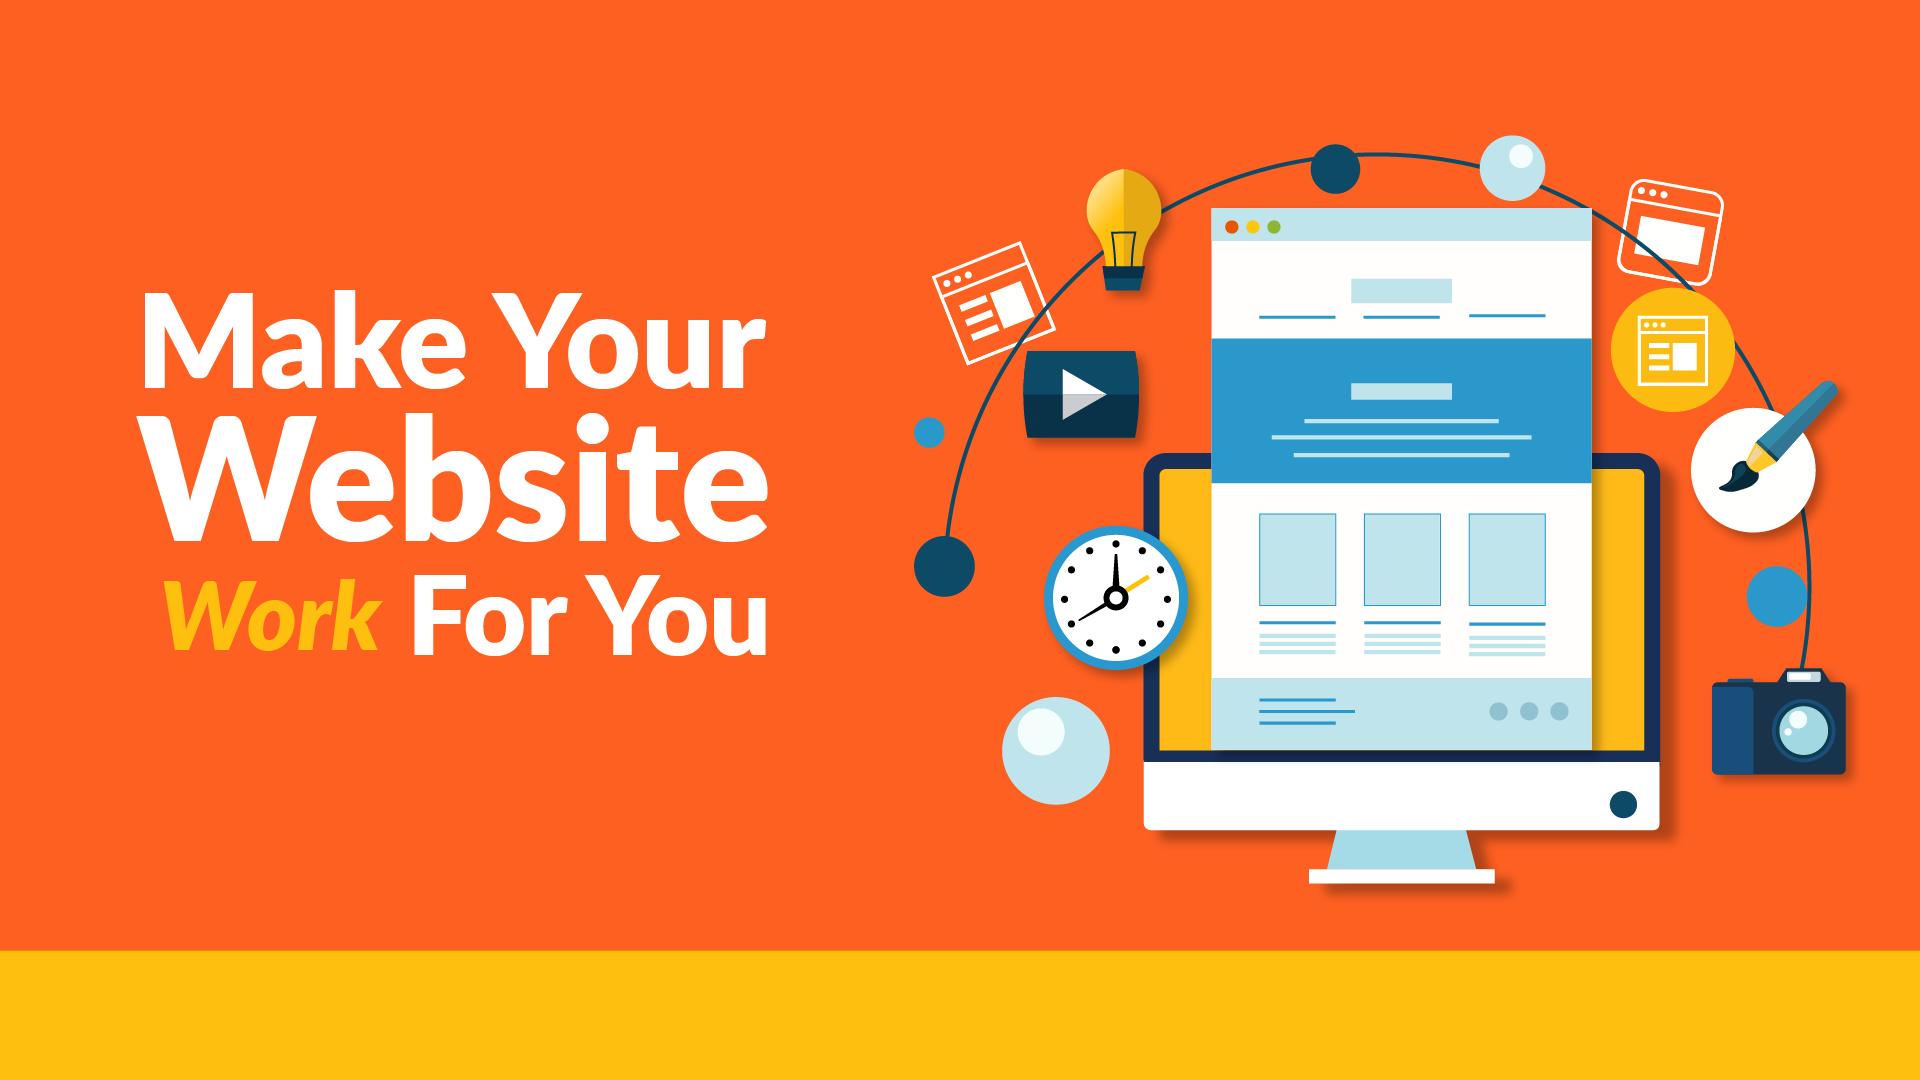 Make-Your-Website-Work-for-you-FaceBook-1920x1080